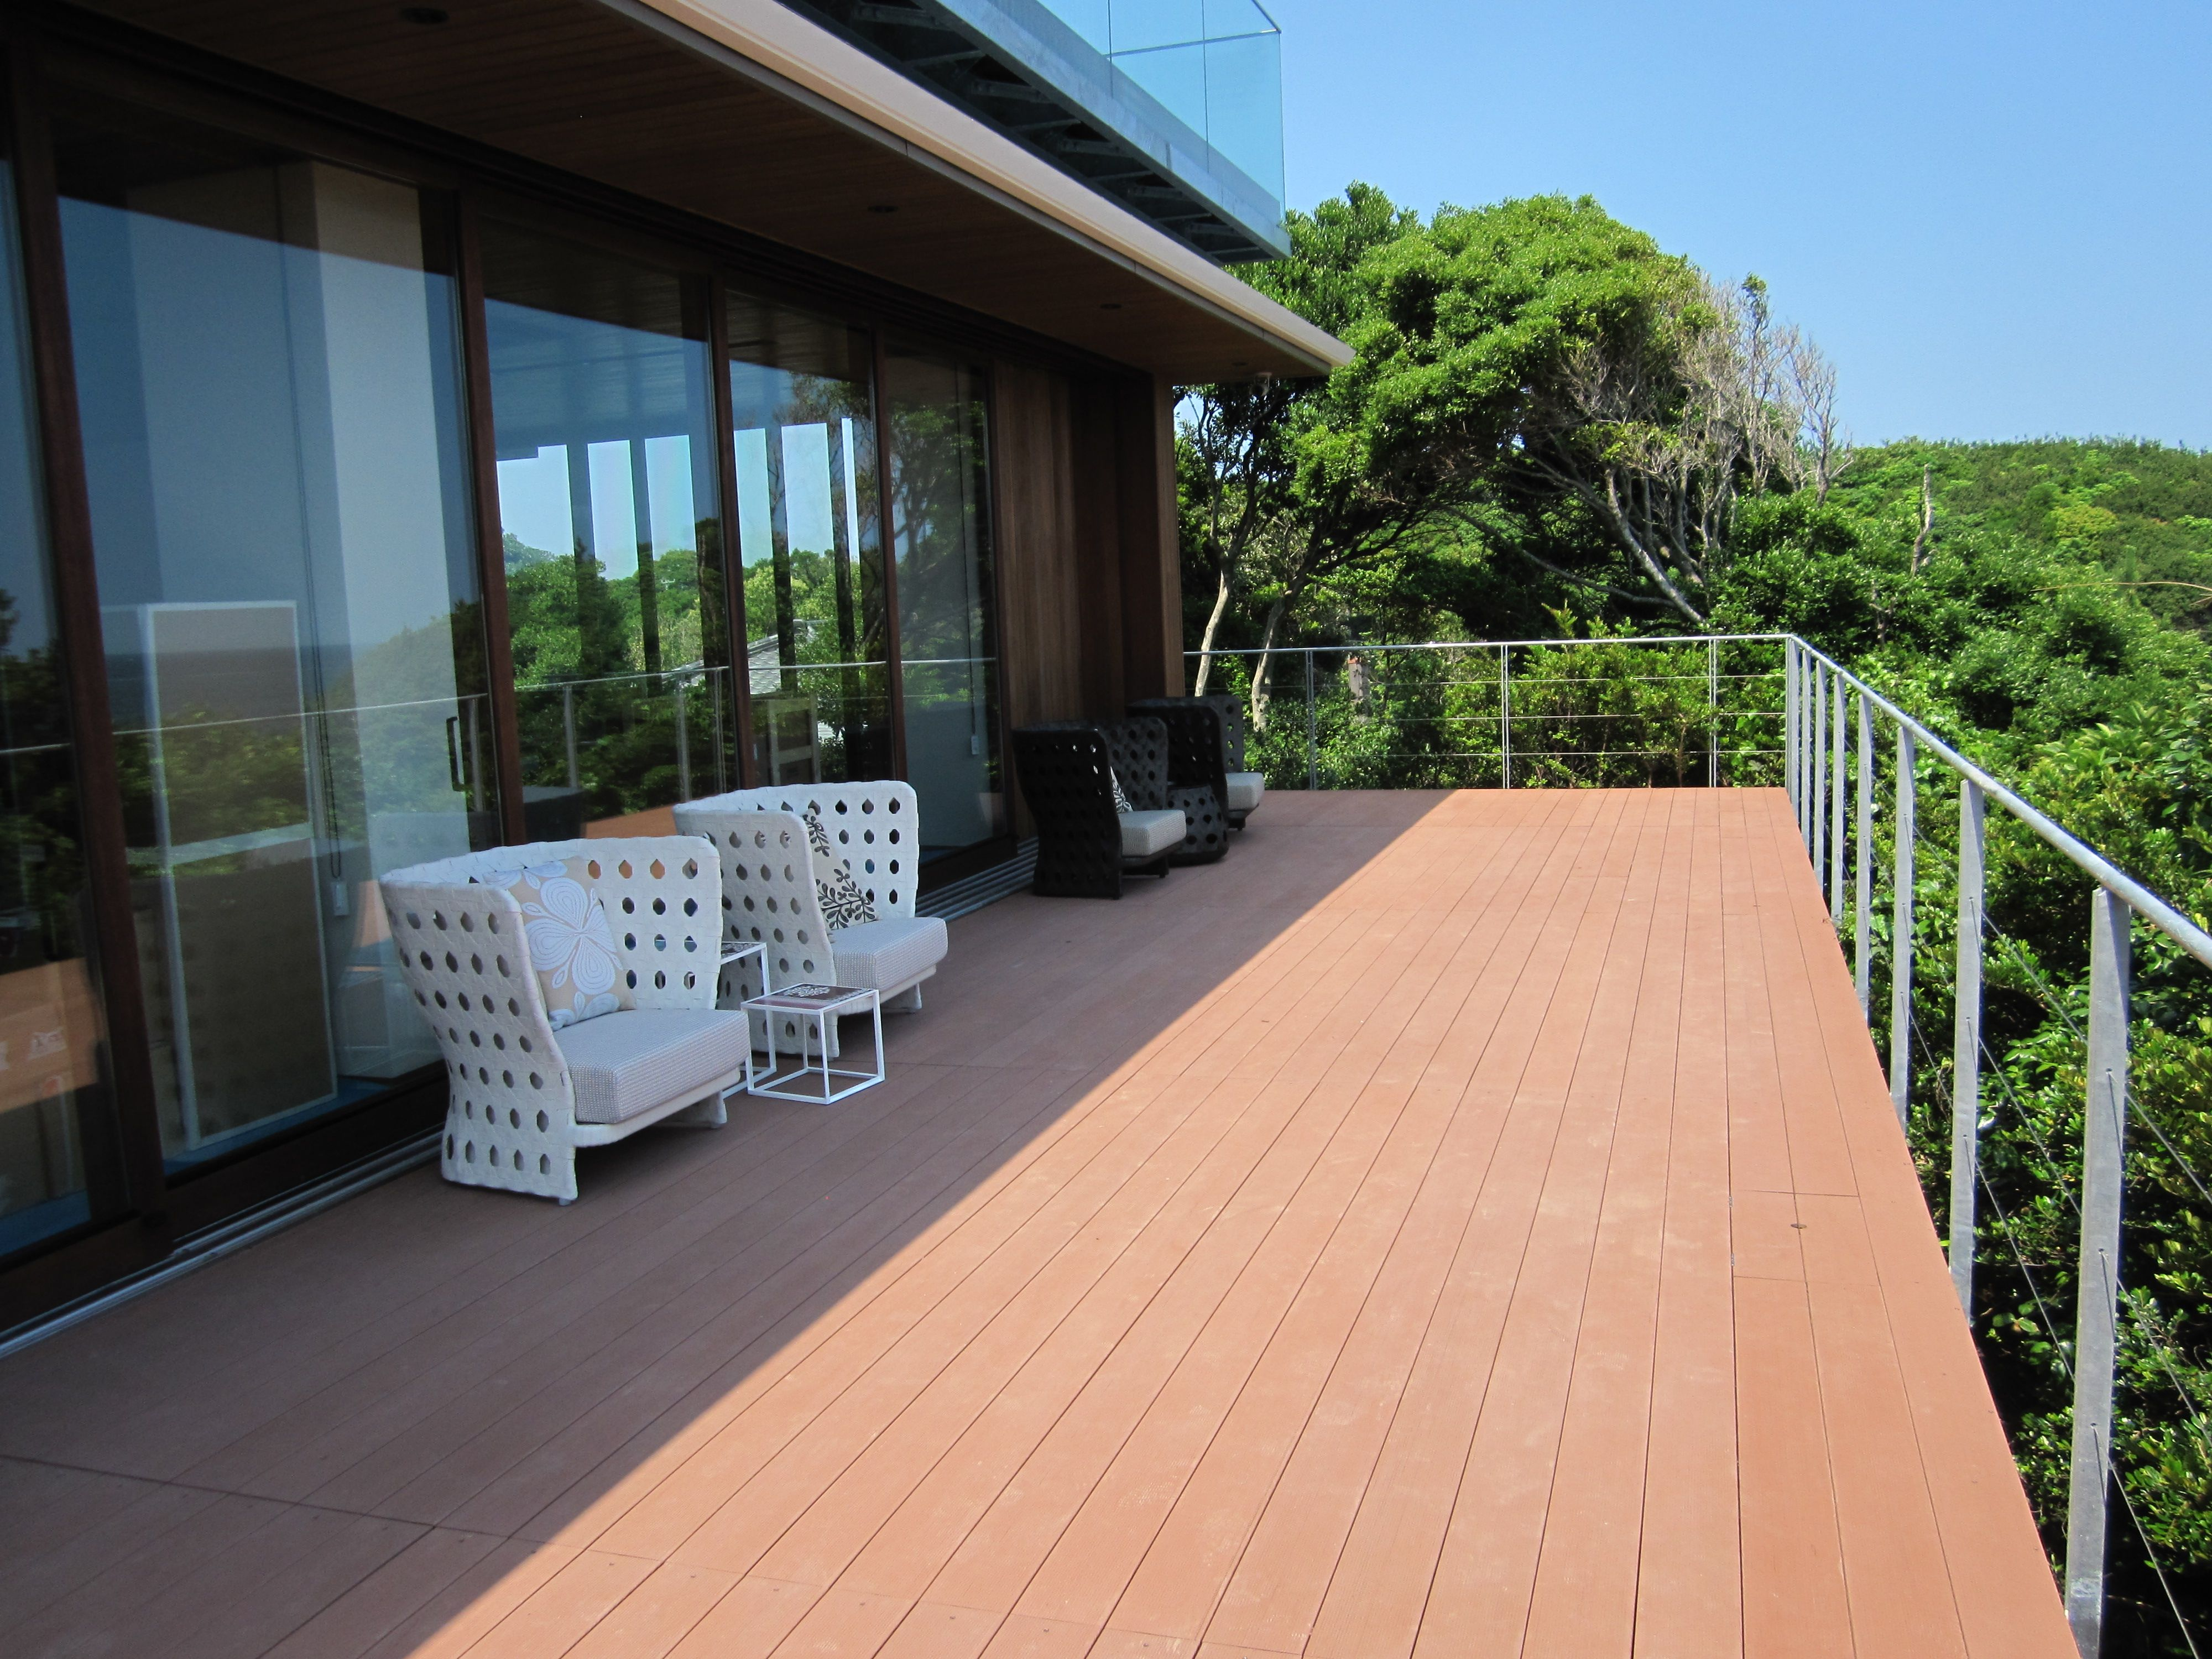 Wood plastic composite flooring materials lightweight easycare wpc decking baanklon Images